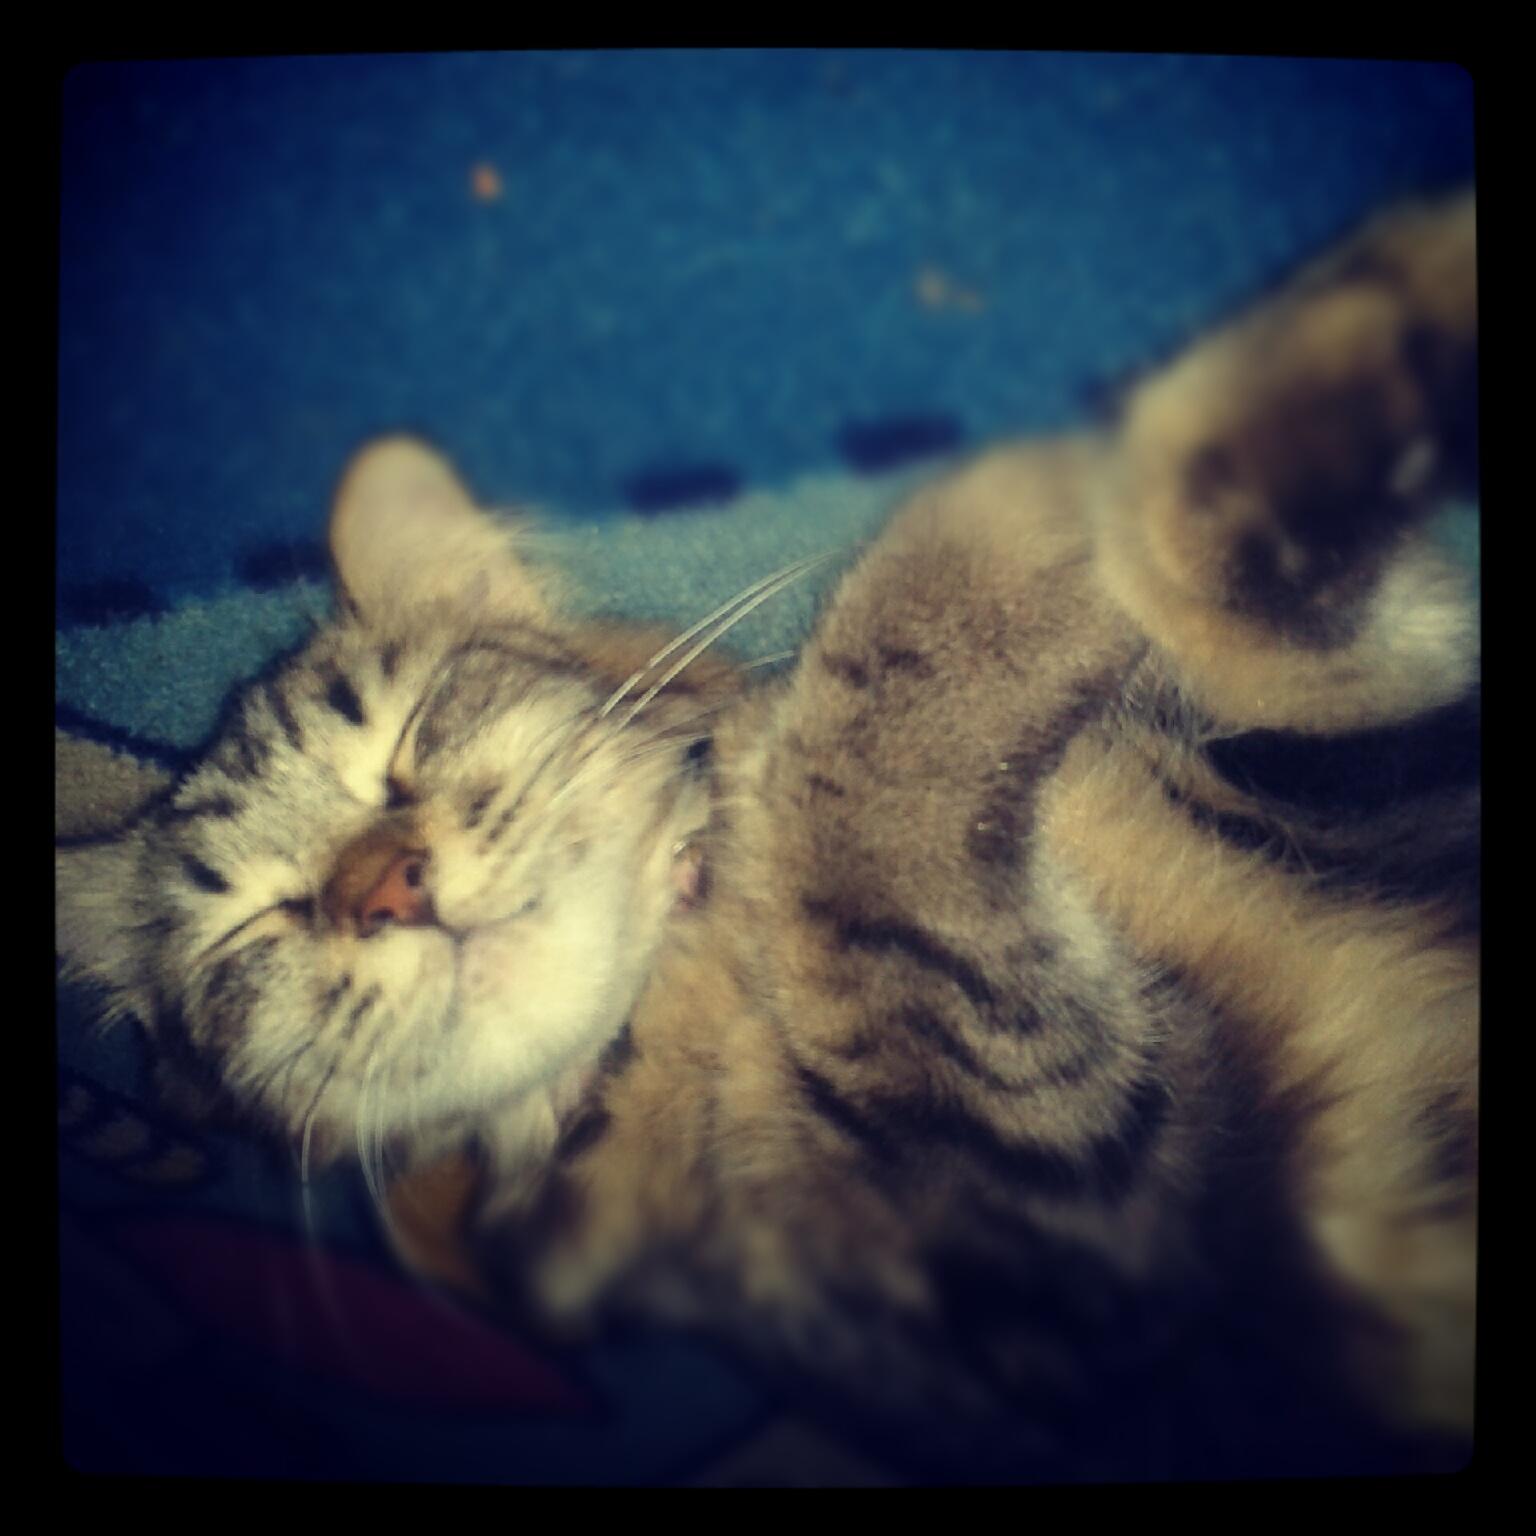 Jenis Kucing Anggora Dan Fotonya 20 Gambar Kucing Lucu